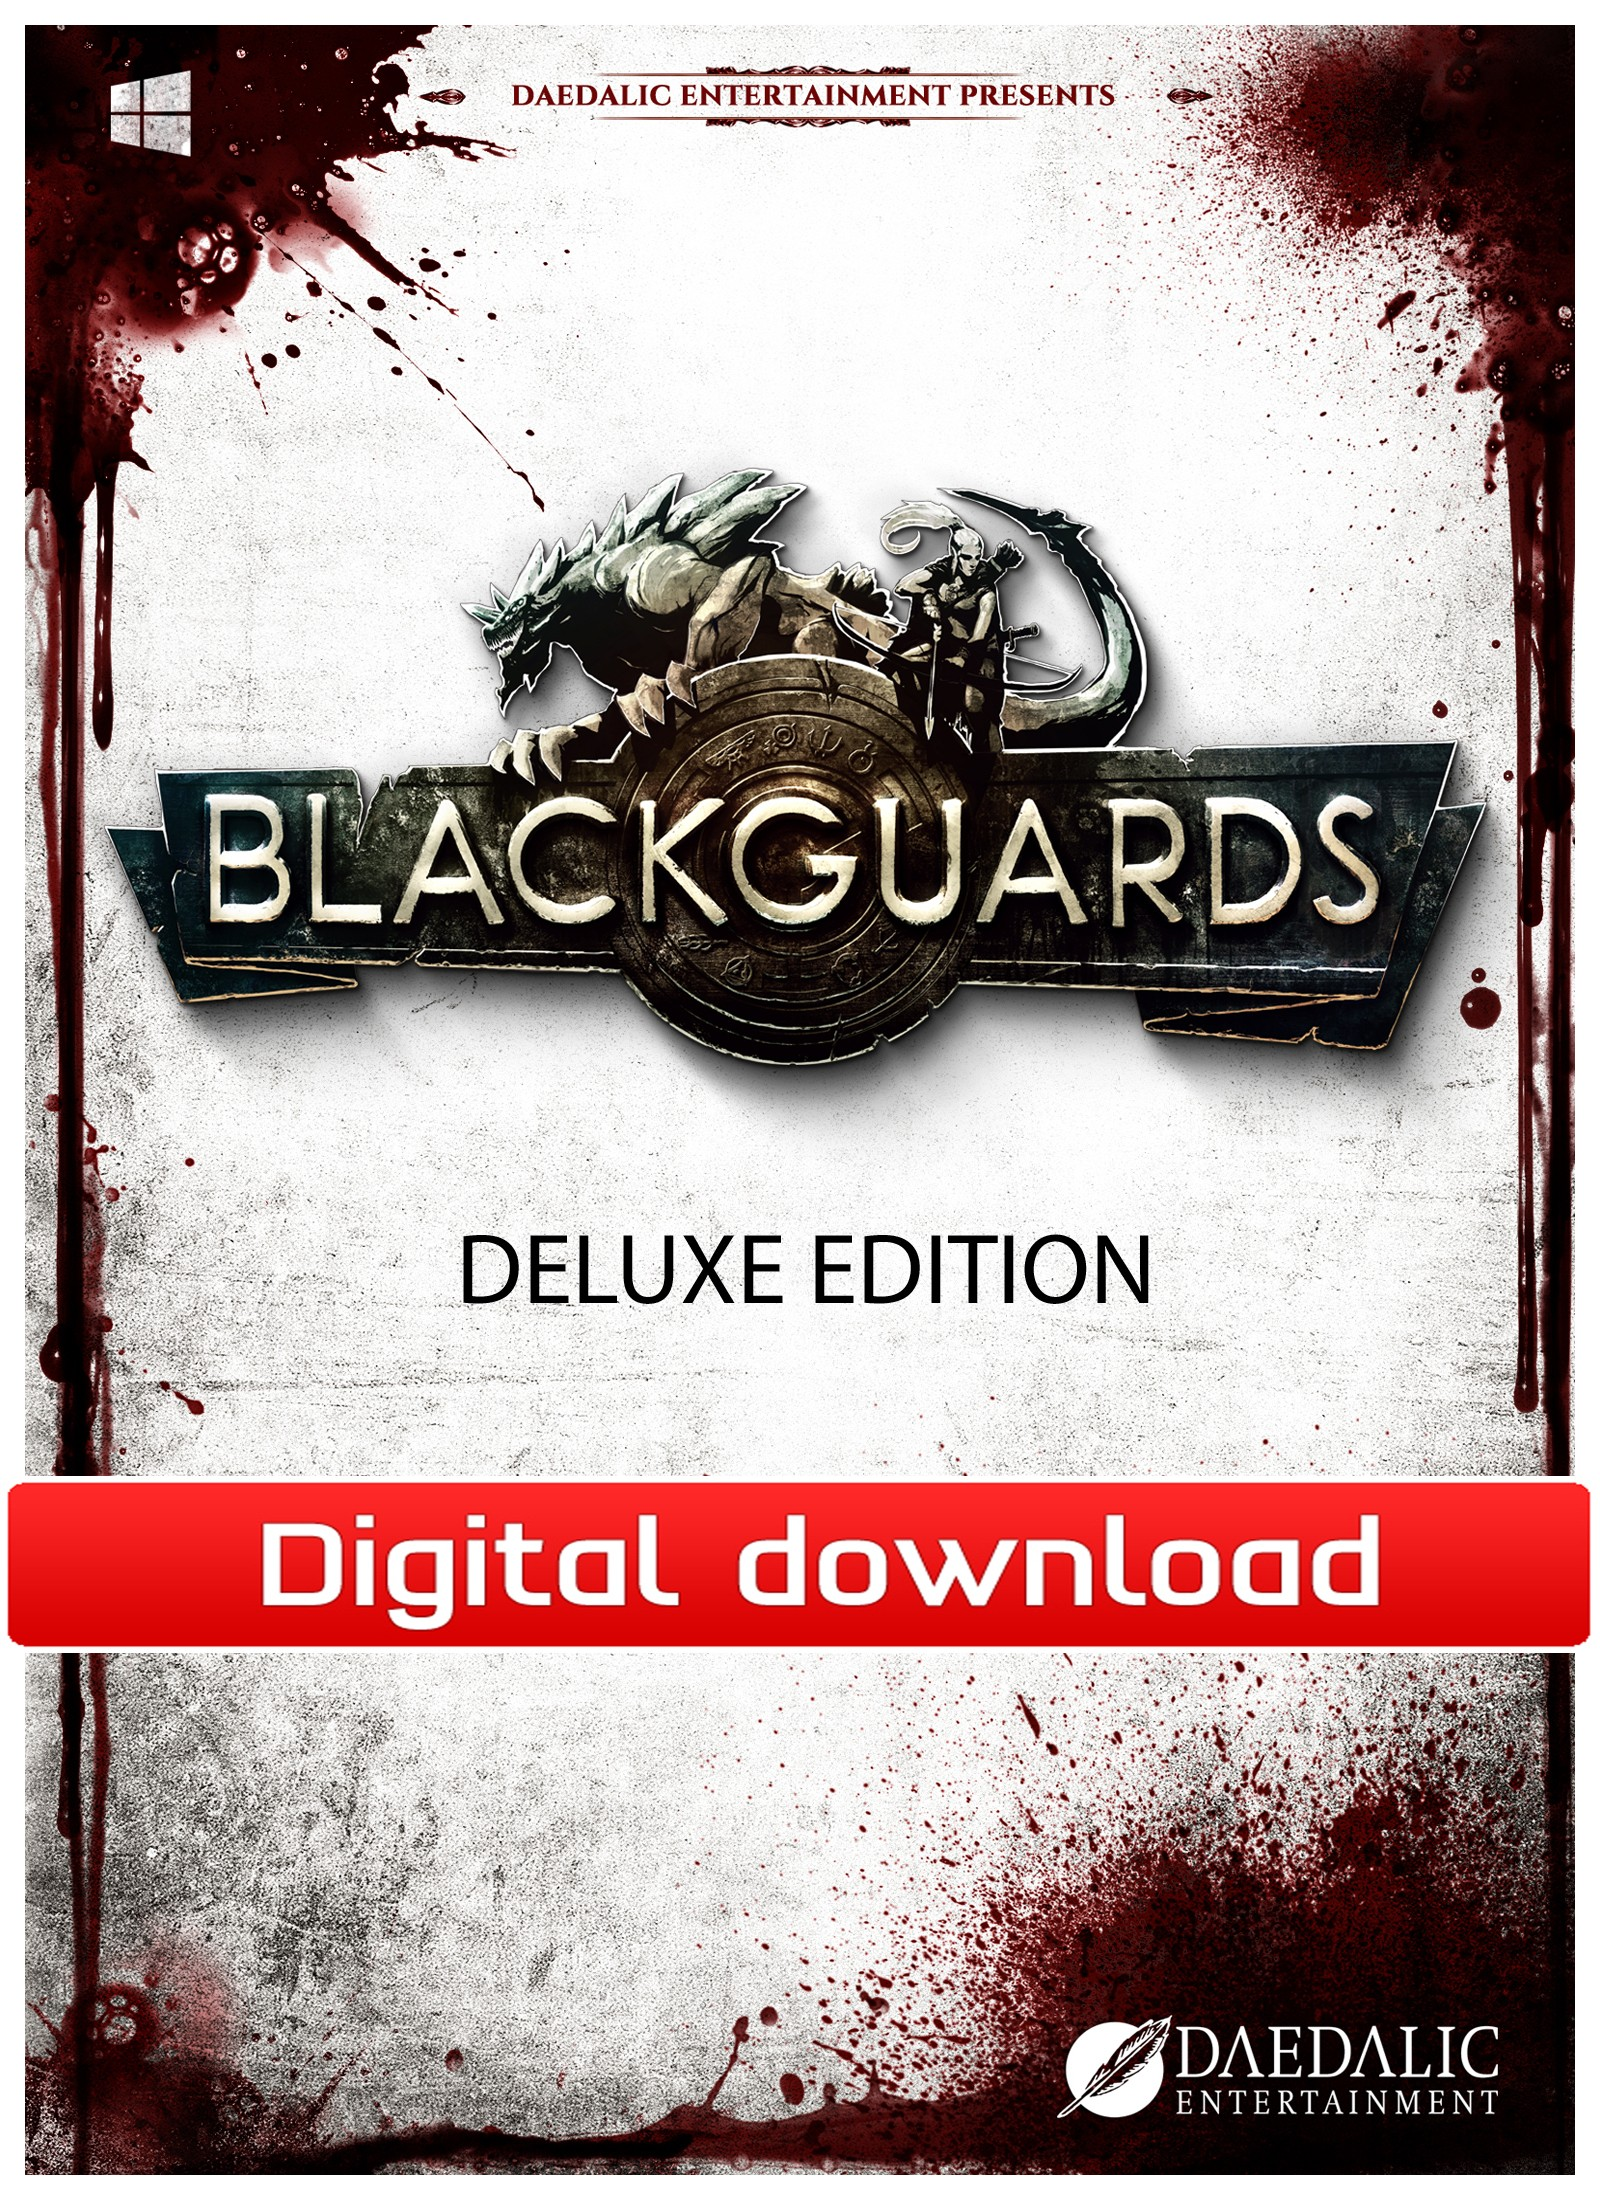 Blackguards Deluxe Edition (PC nedlastning) PCDD36367